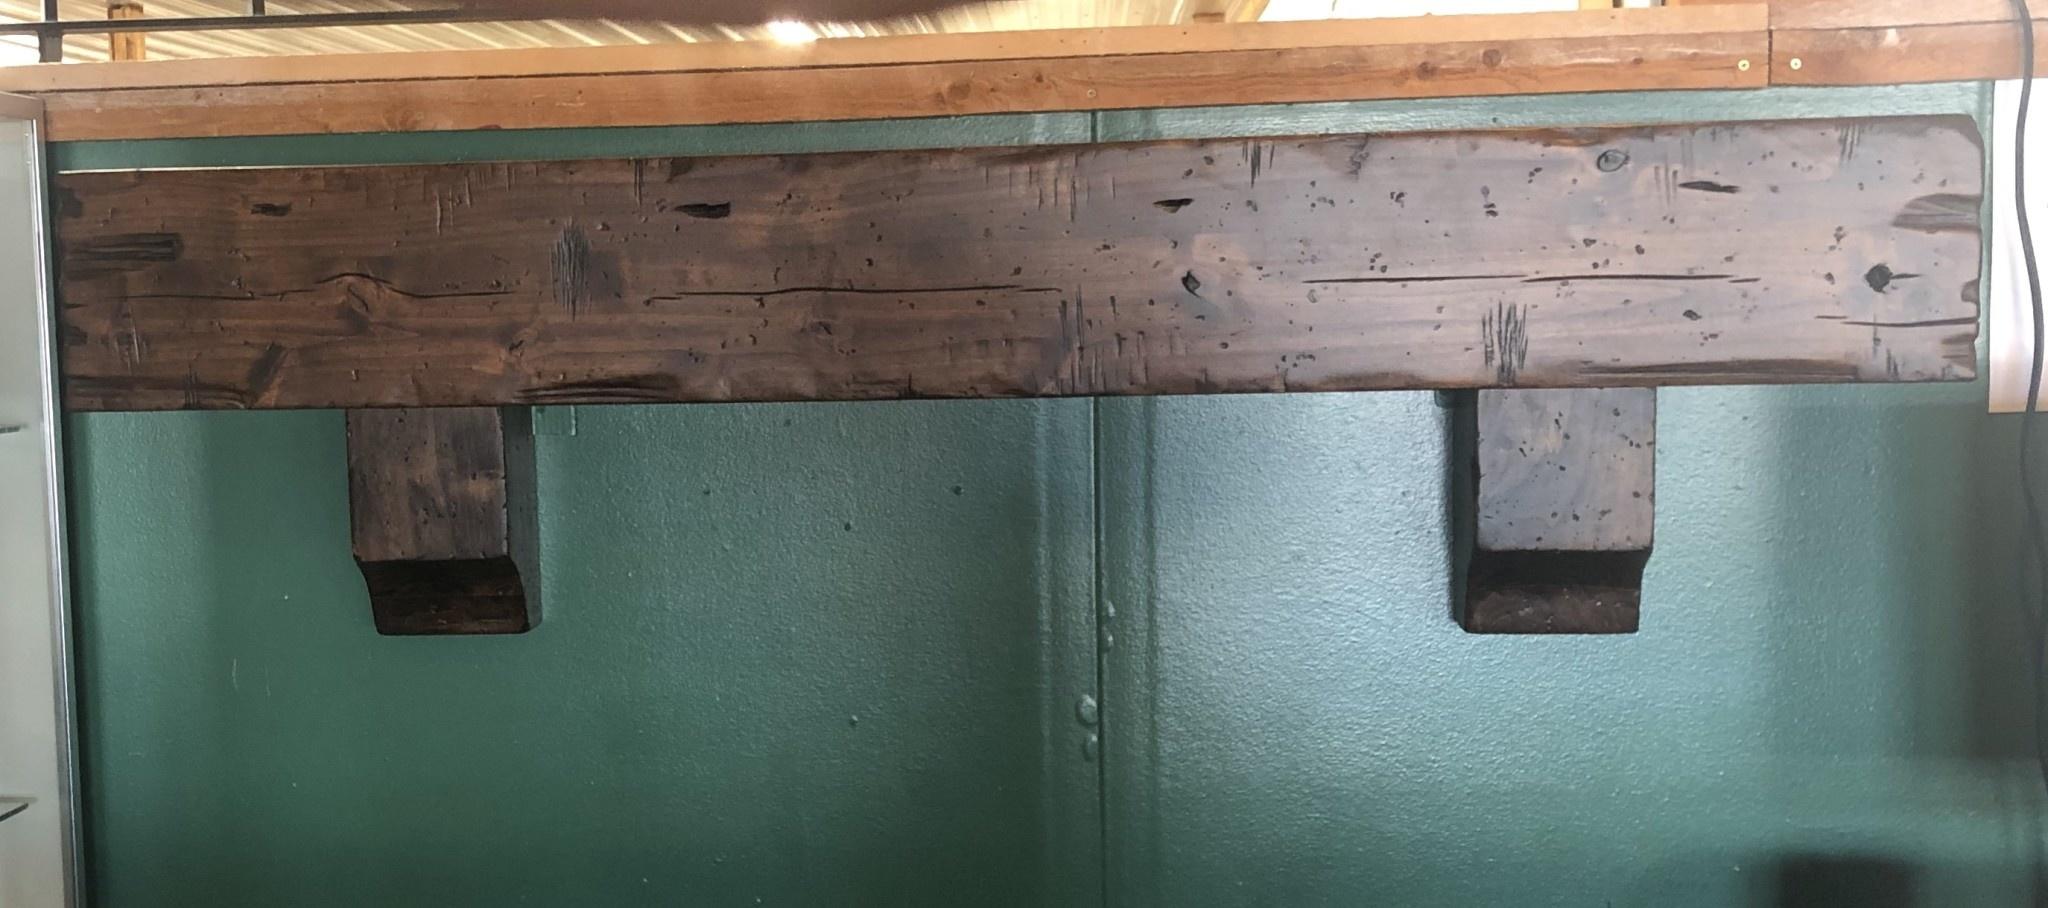 Rustic North Alder Box Mantle w/corbels  60W x 10D x 8H